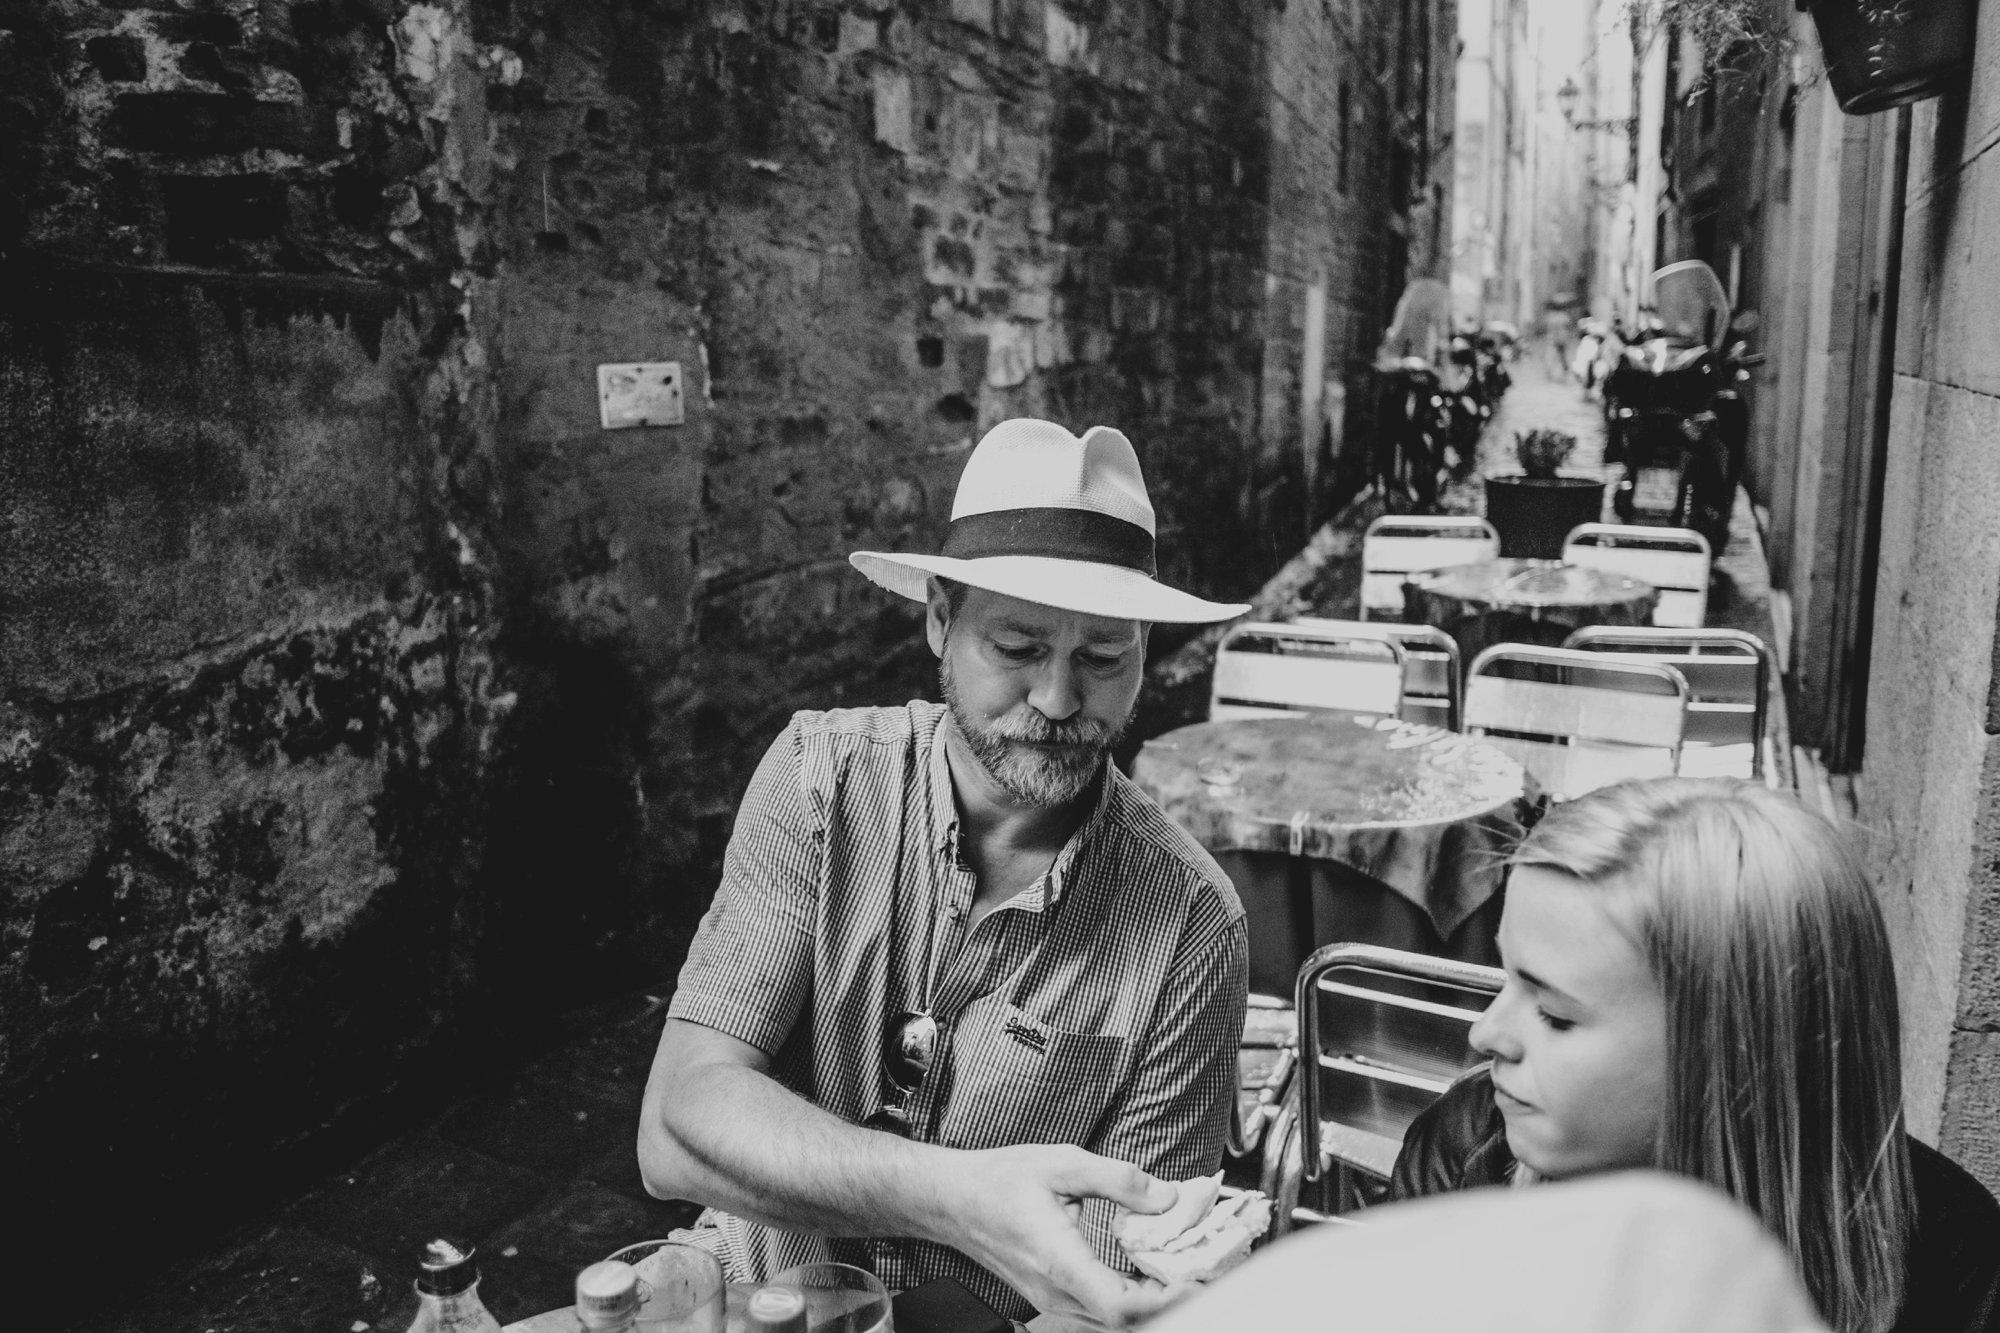 Cafe Florence Italy Essex Documentary Wedding Travel Photographer